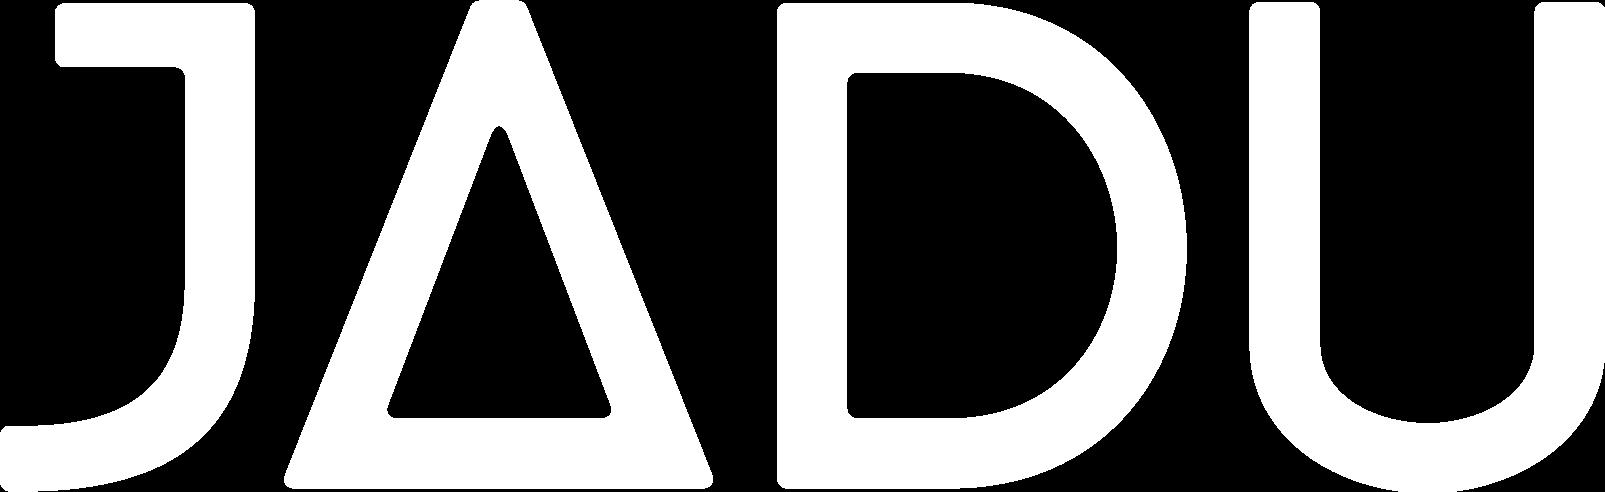 jadu-brandmark-white